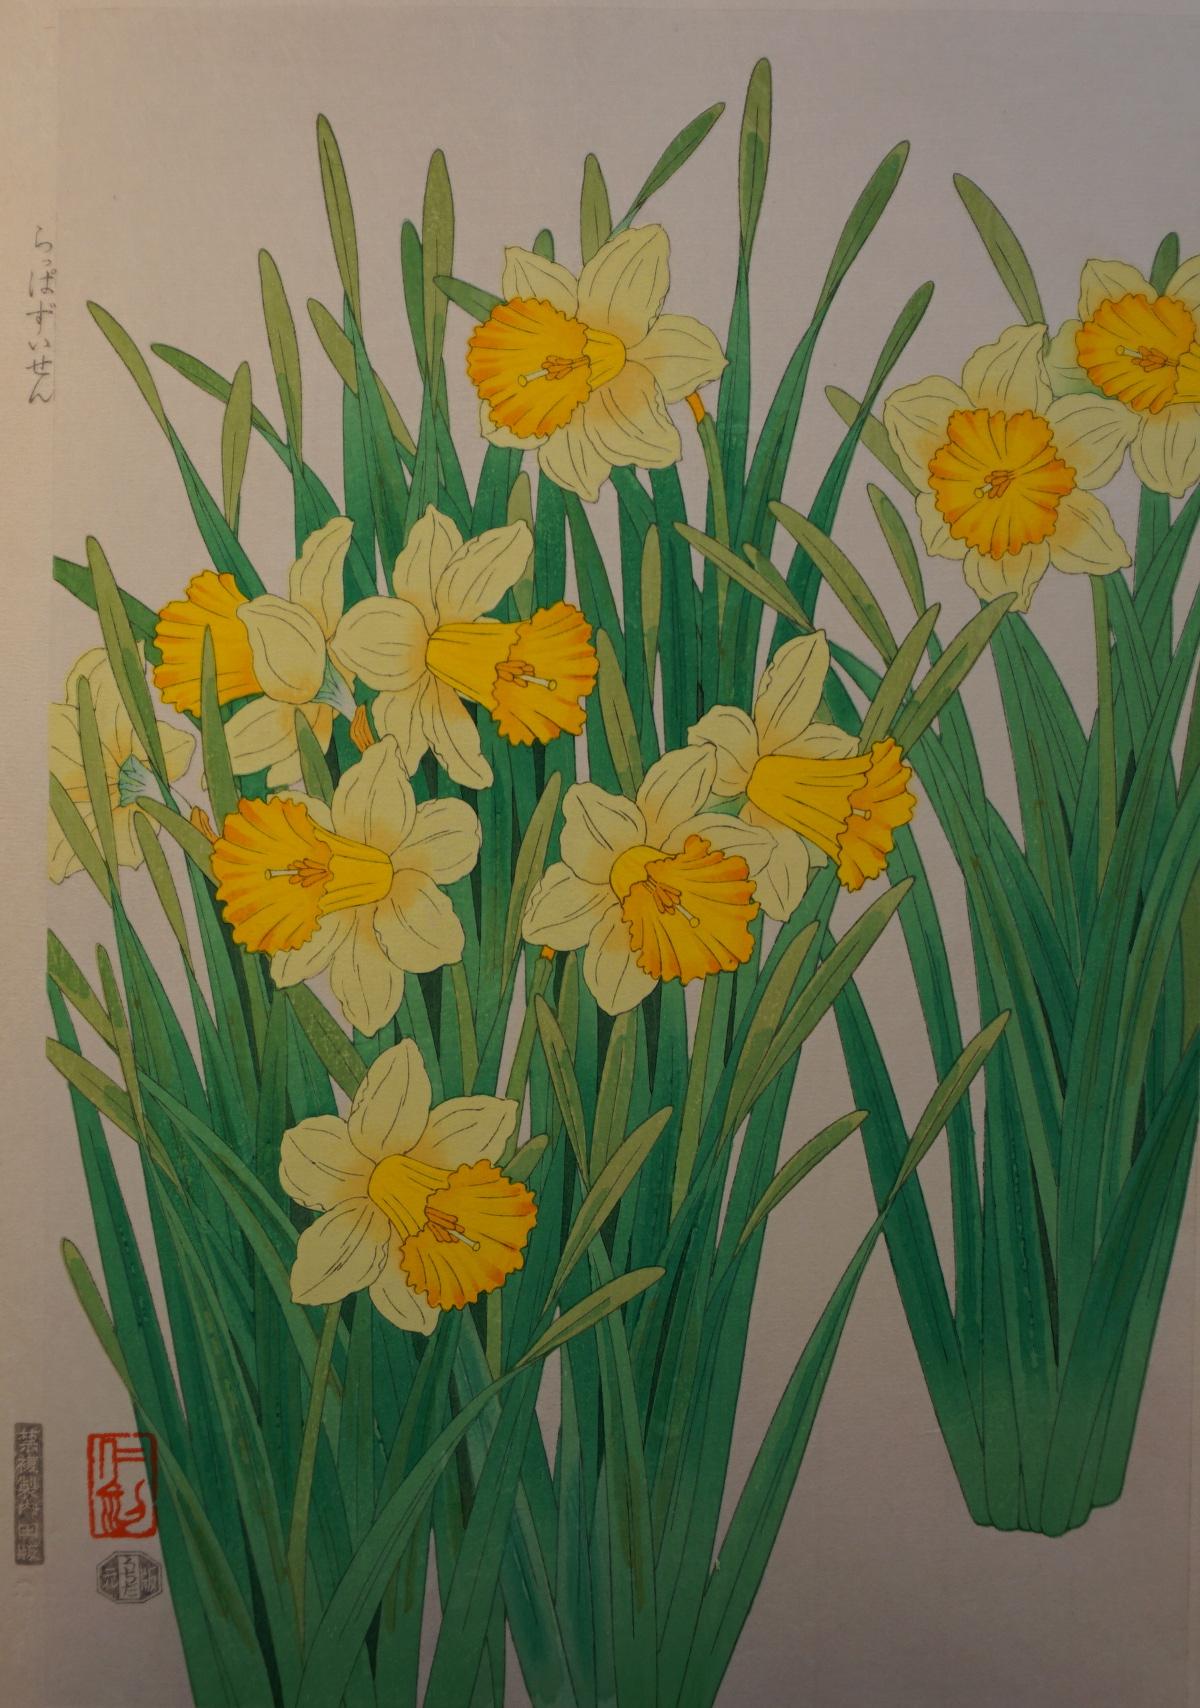 日本の版画 - 花 - 常設展